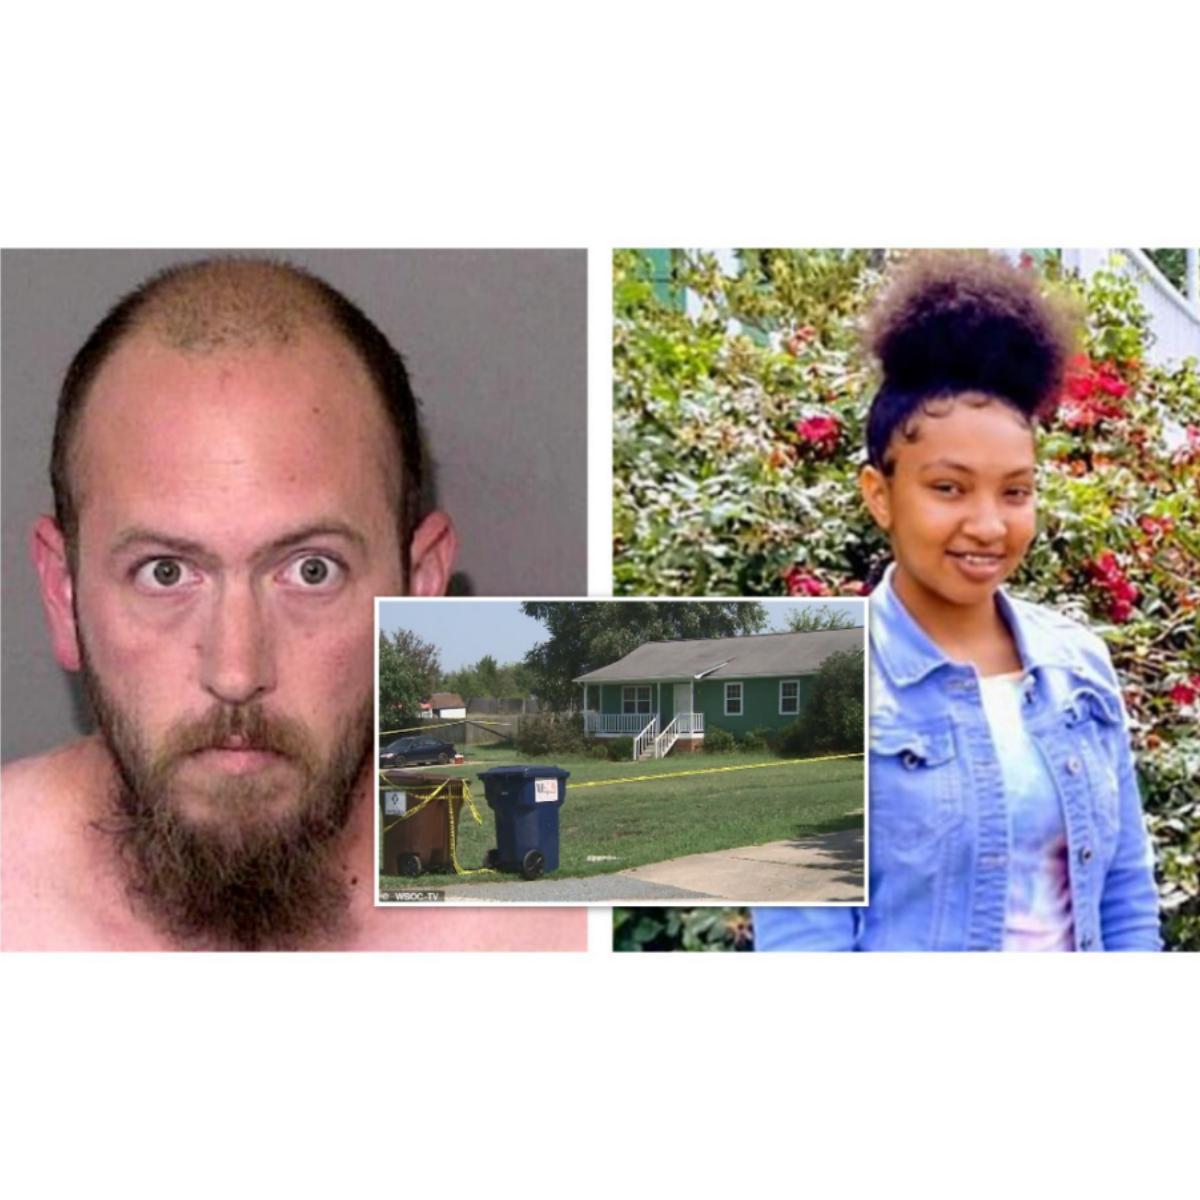 North Carolina Dad Strangles And Slits 15-Year-Old Daughter's Throat